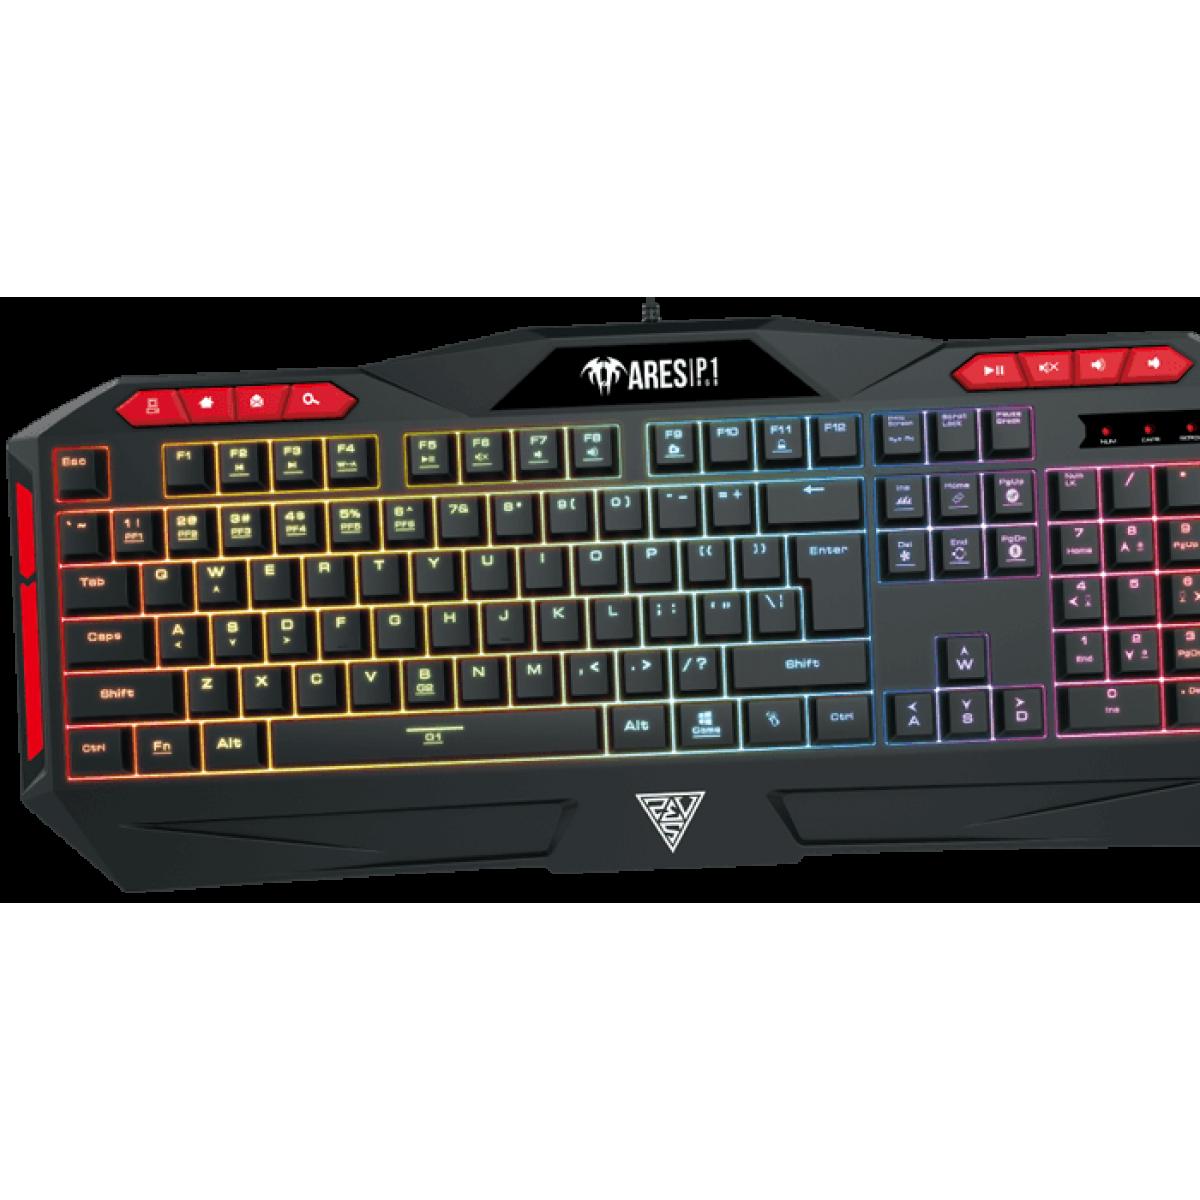 Teclado Gamer Gamdias Ares P1 RGB Preto